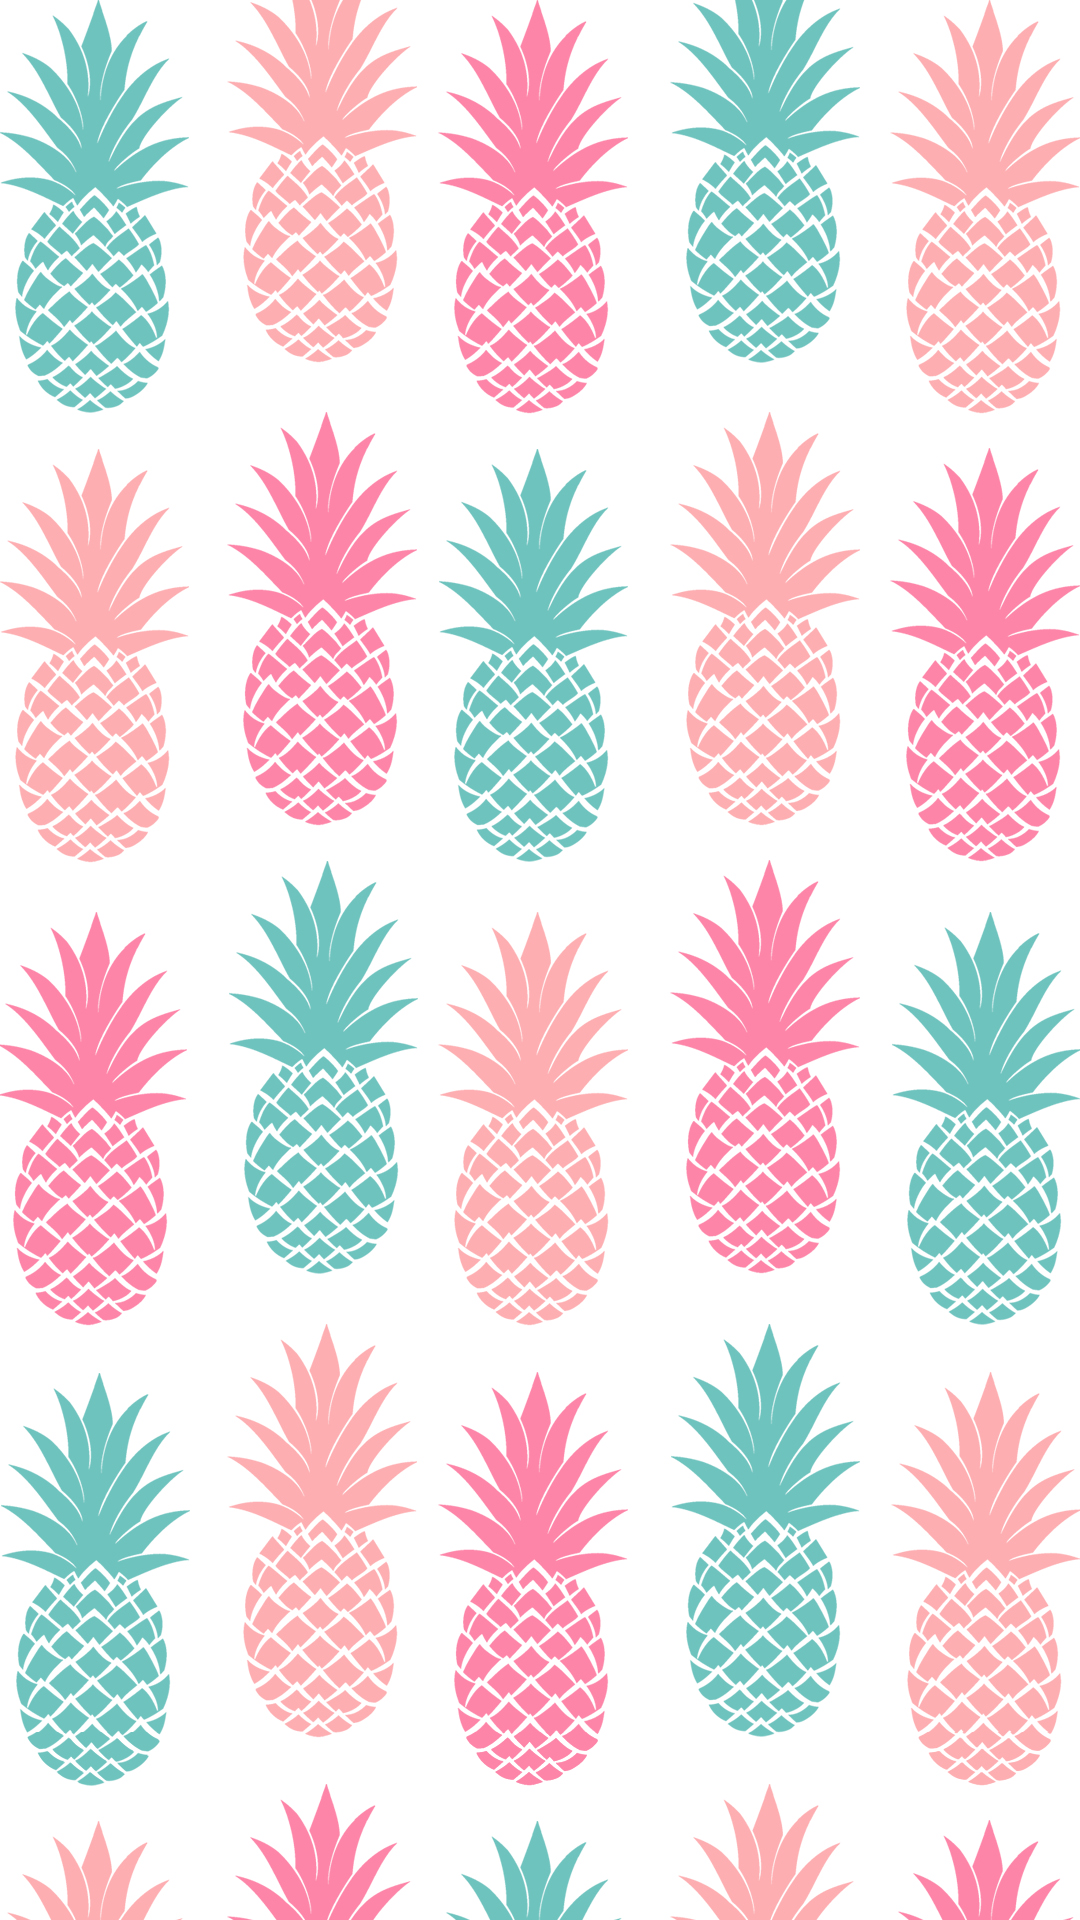 Amazing Wallpaper Macbook Artsy - artsy-iPhone_wallpaper_7  Gallery_725783.jpg